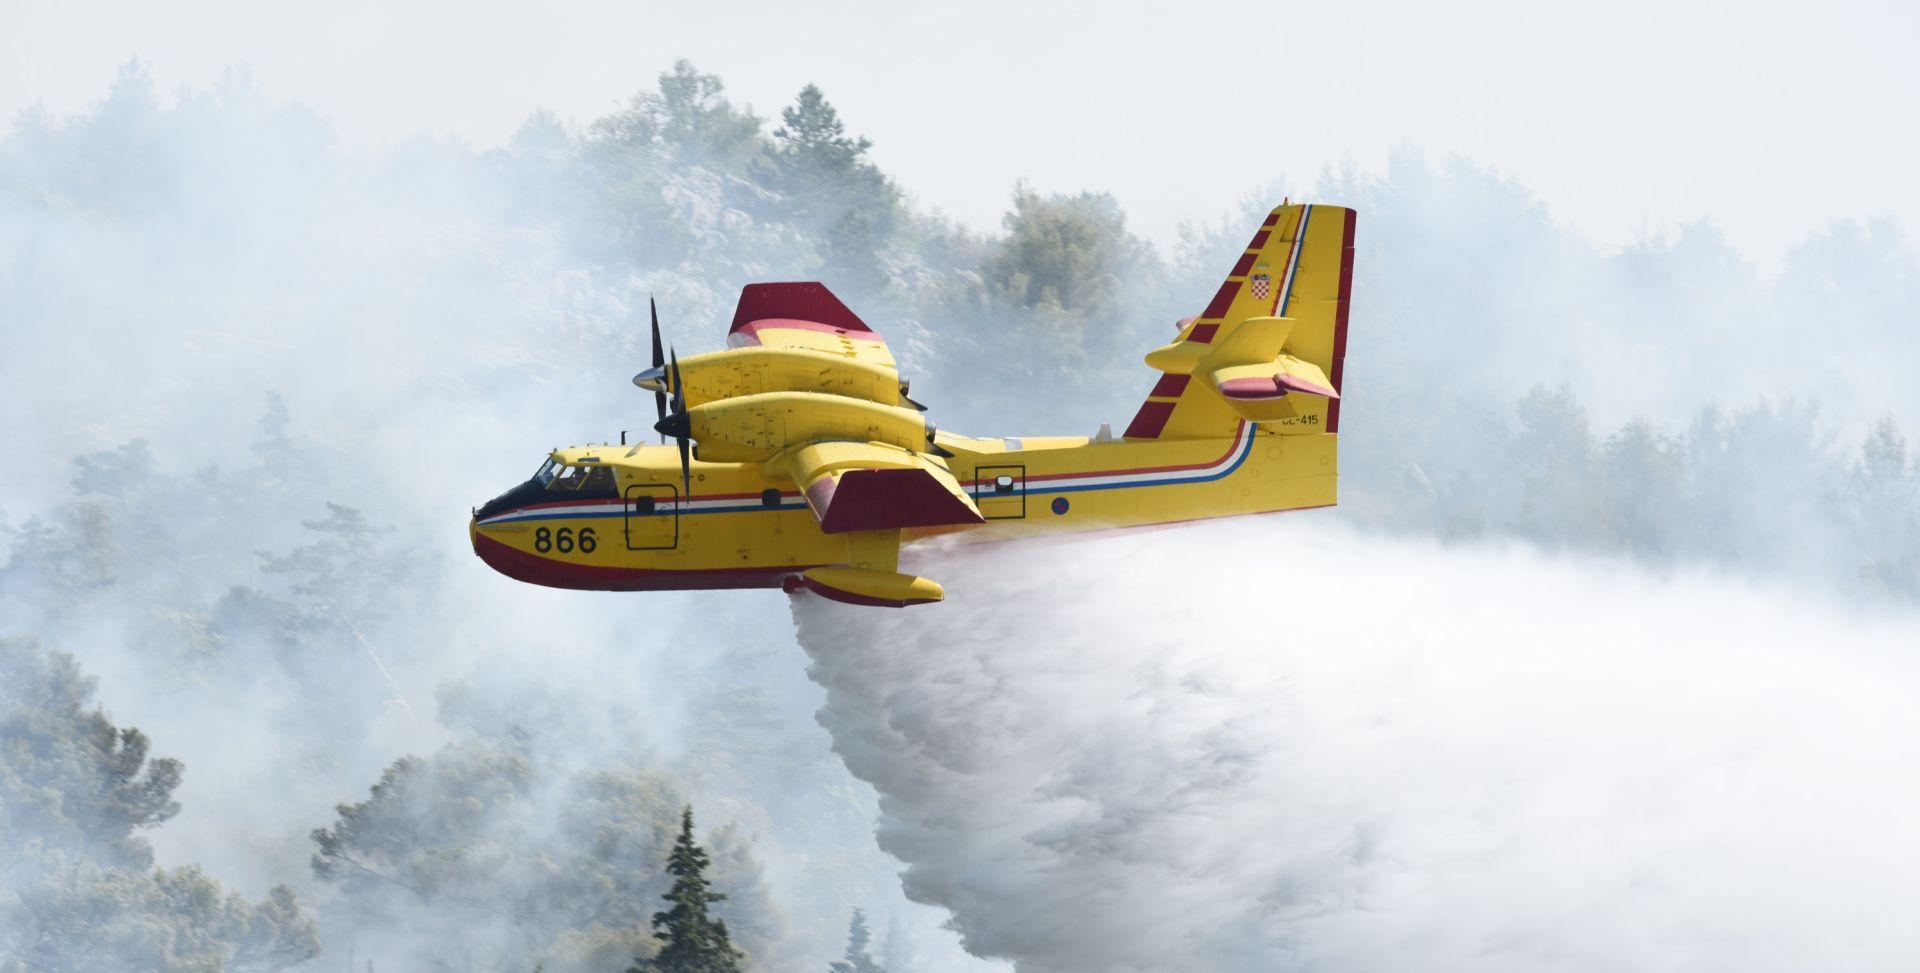 BRZA REAKCIJA Požar iznad Omiša pod kontrolom gasitelja, zračne snage gasile dva požara